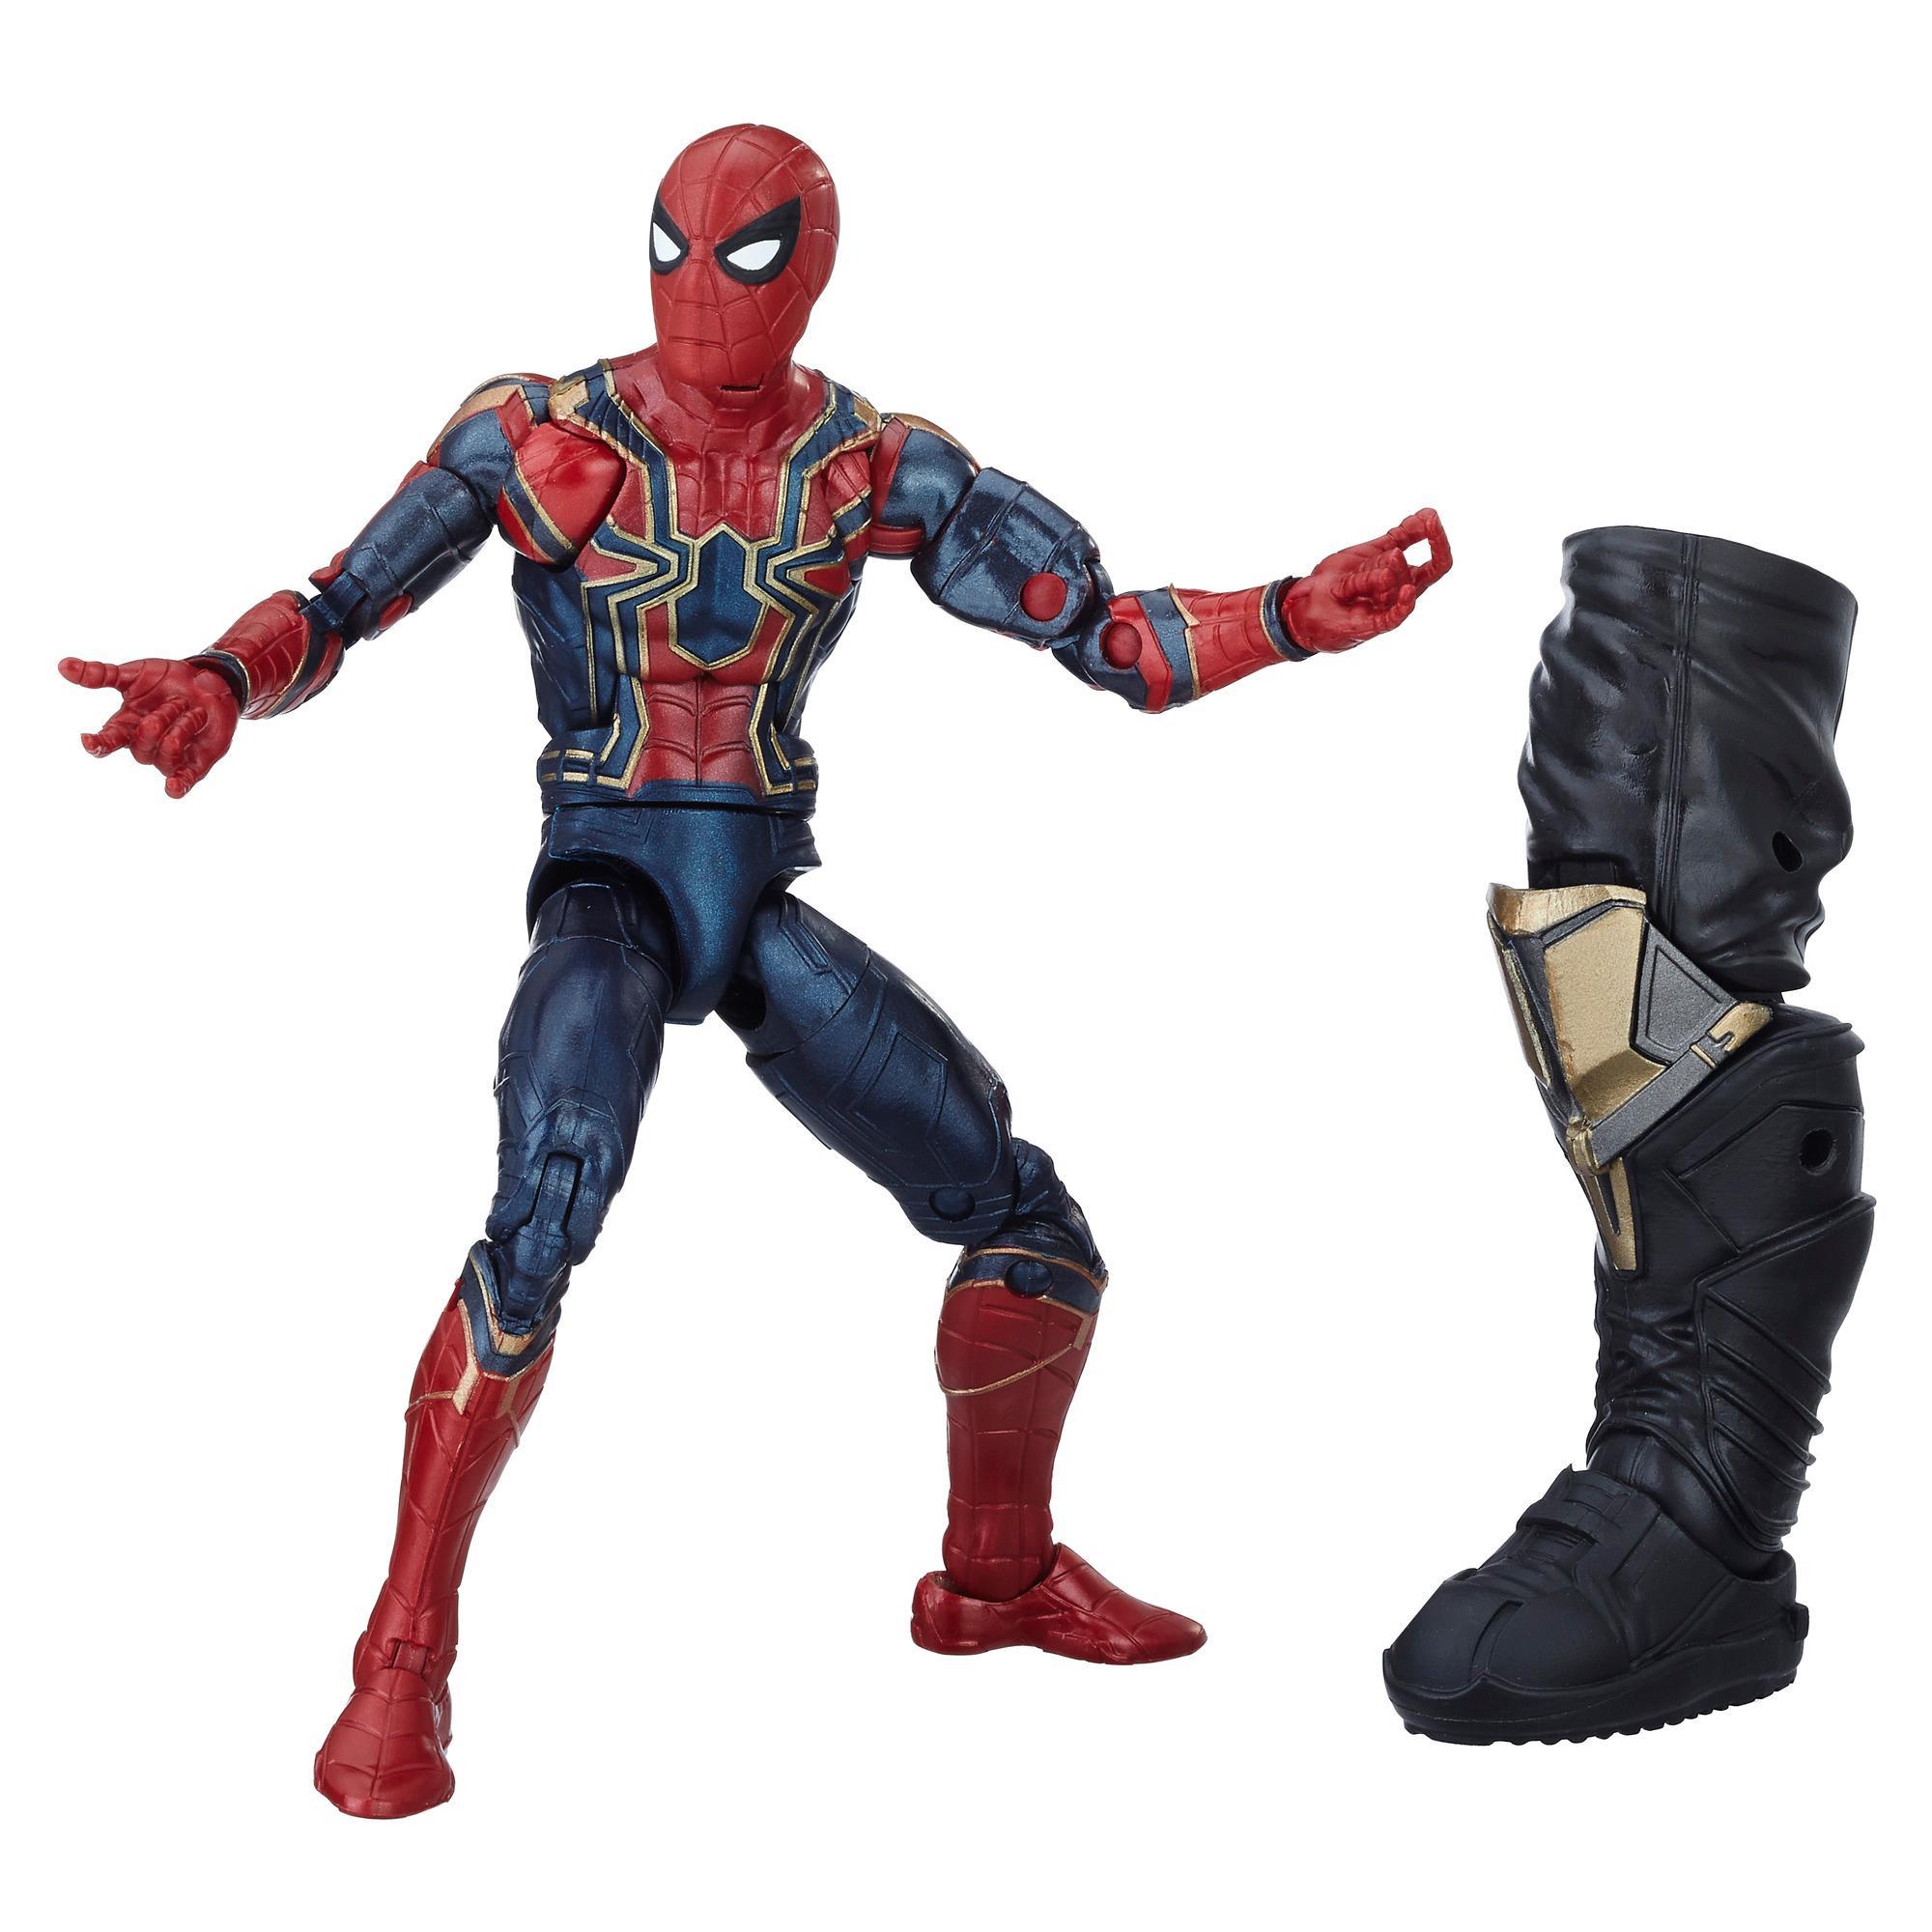 Avengers Marvel Legends Series 6-inch Spider-Man